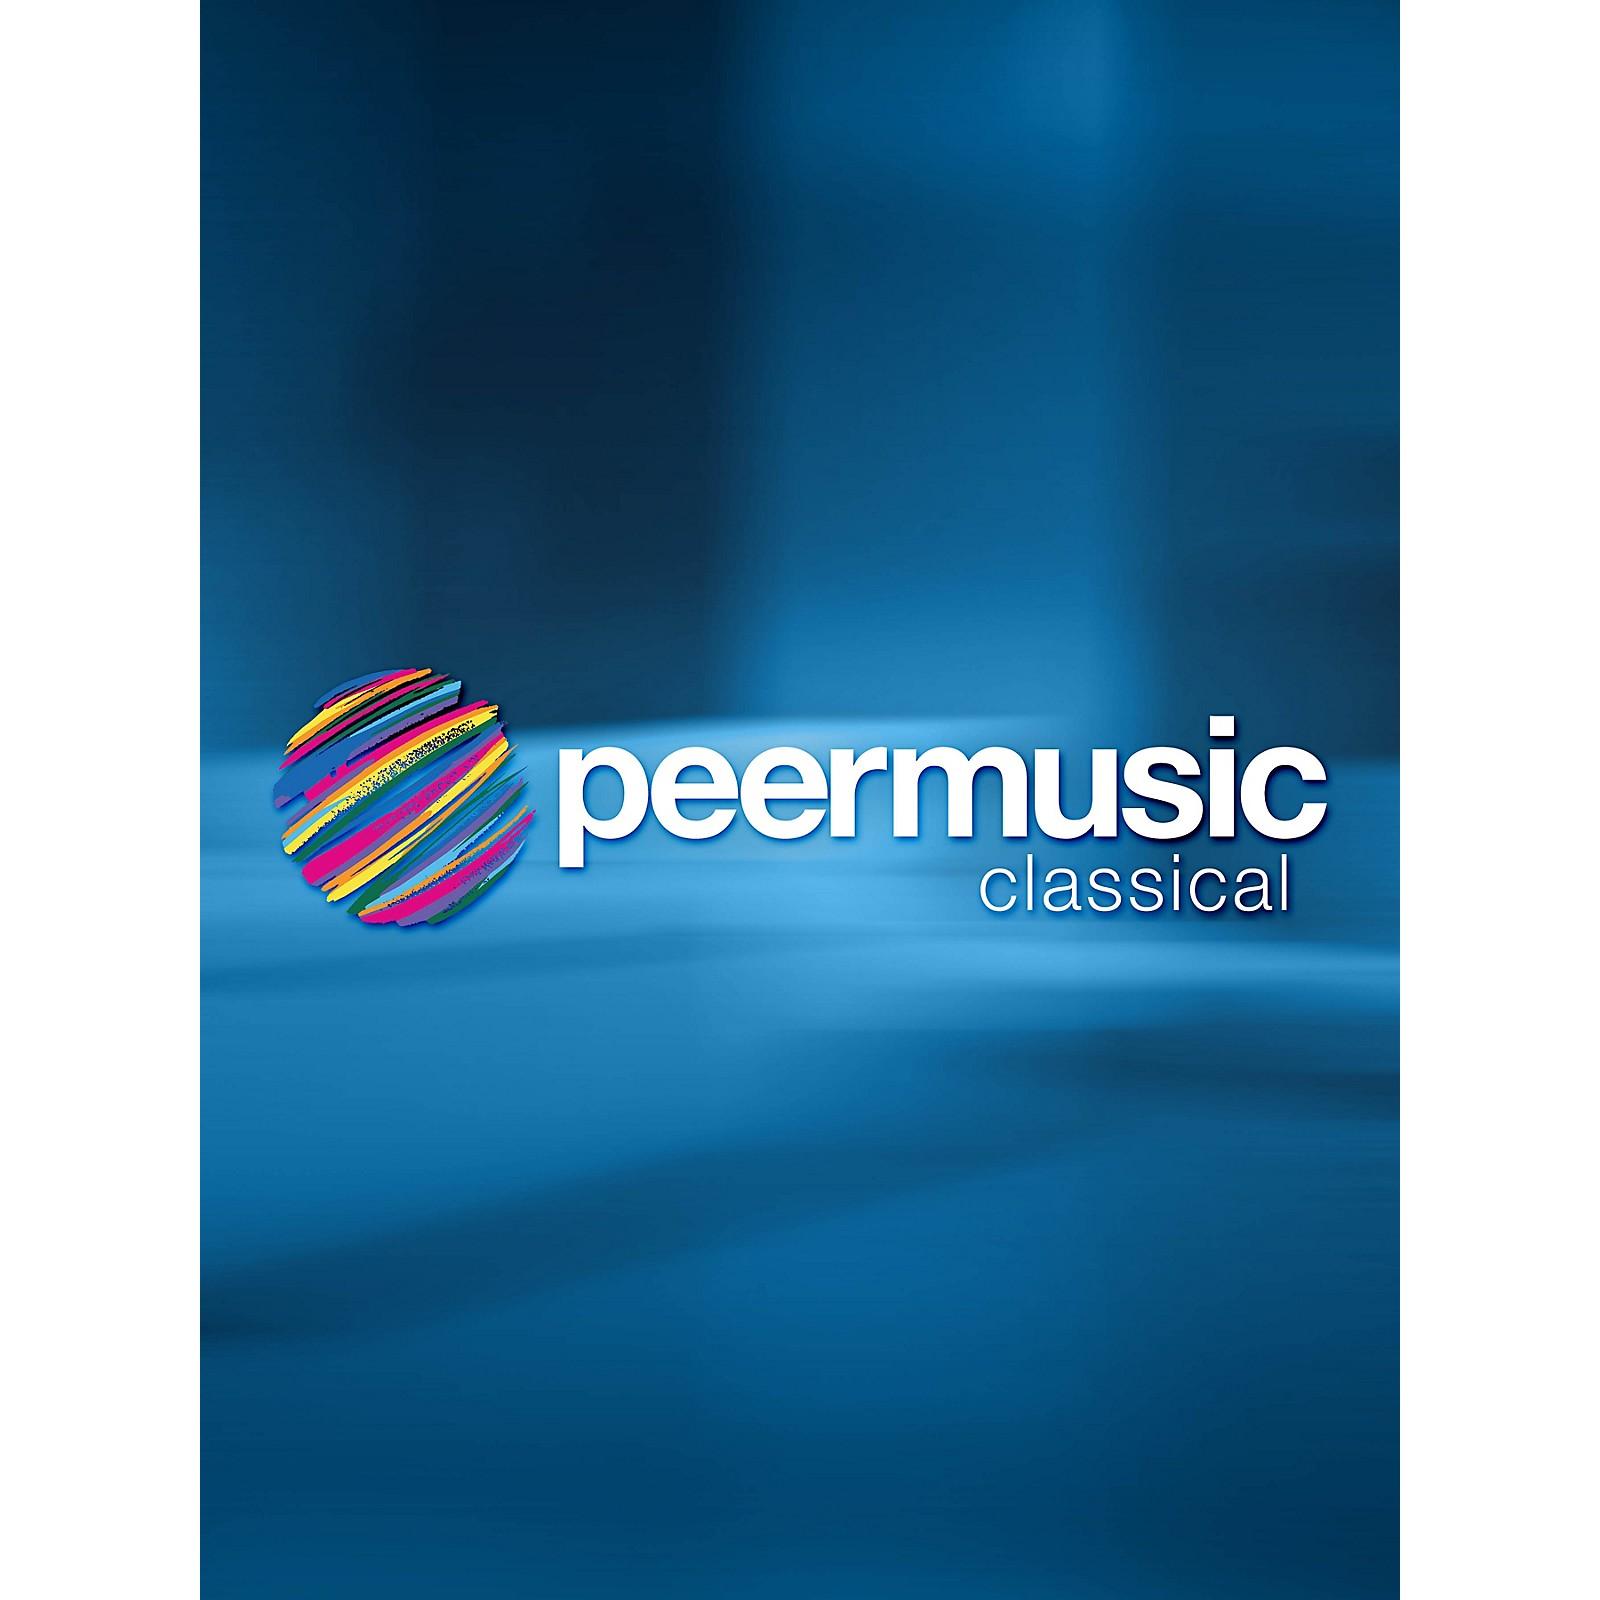 Peer Music Three Songs on Poems of Paul Kane - High Voice and Marimba Peermusic Classical Series by Richard Wilson